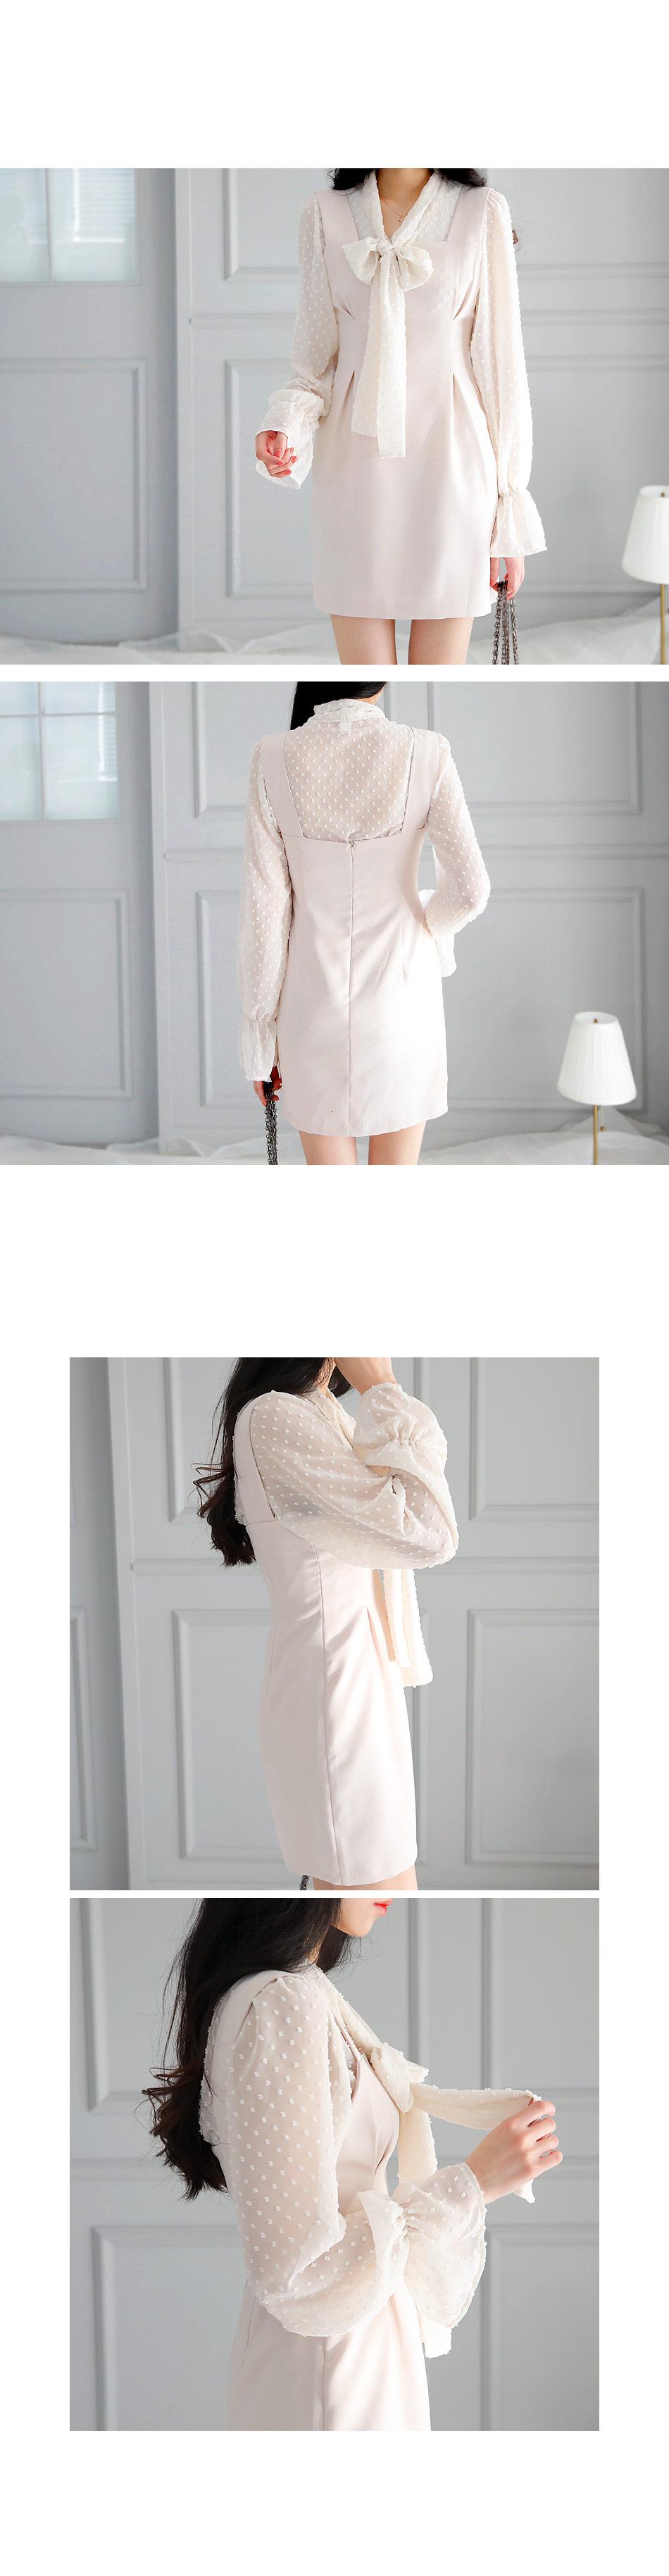 Blossom bud blouse